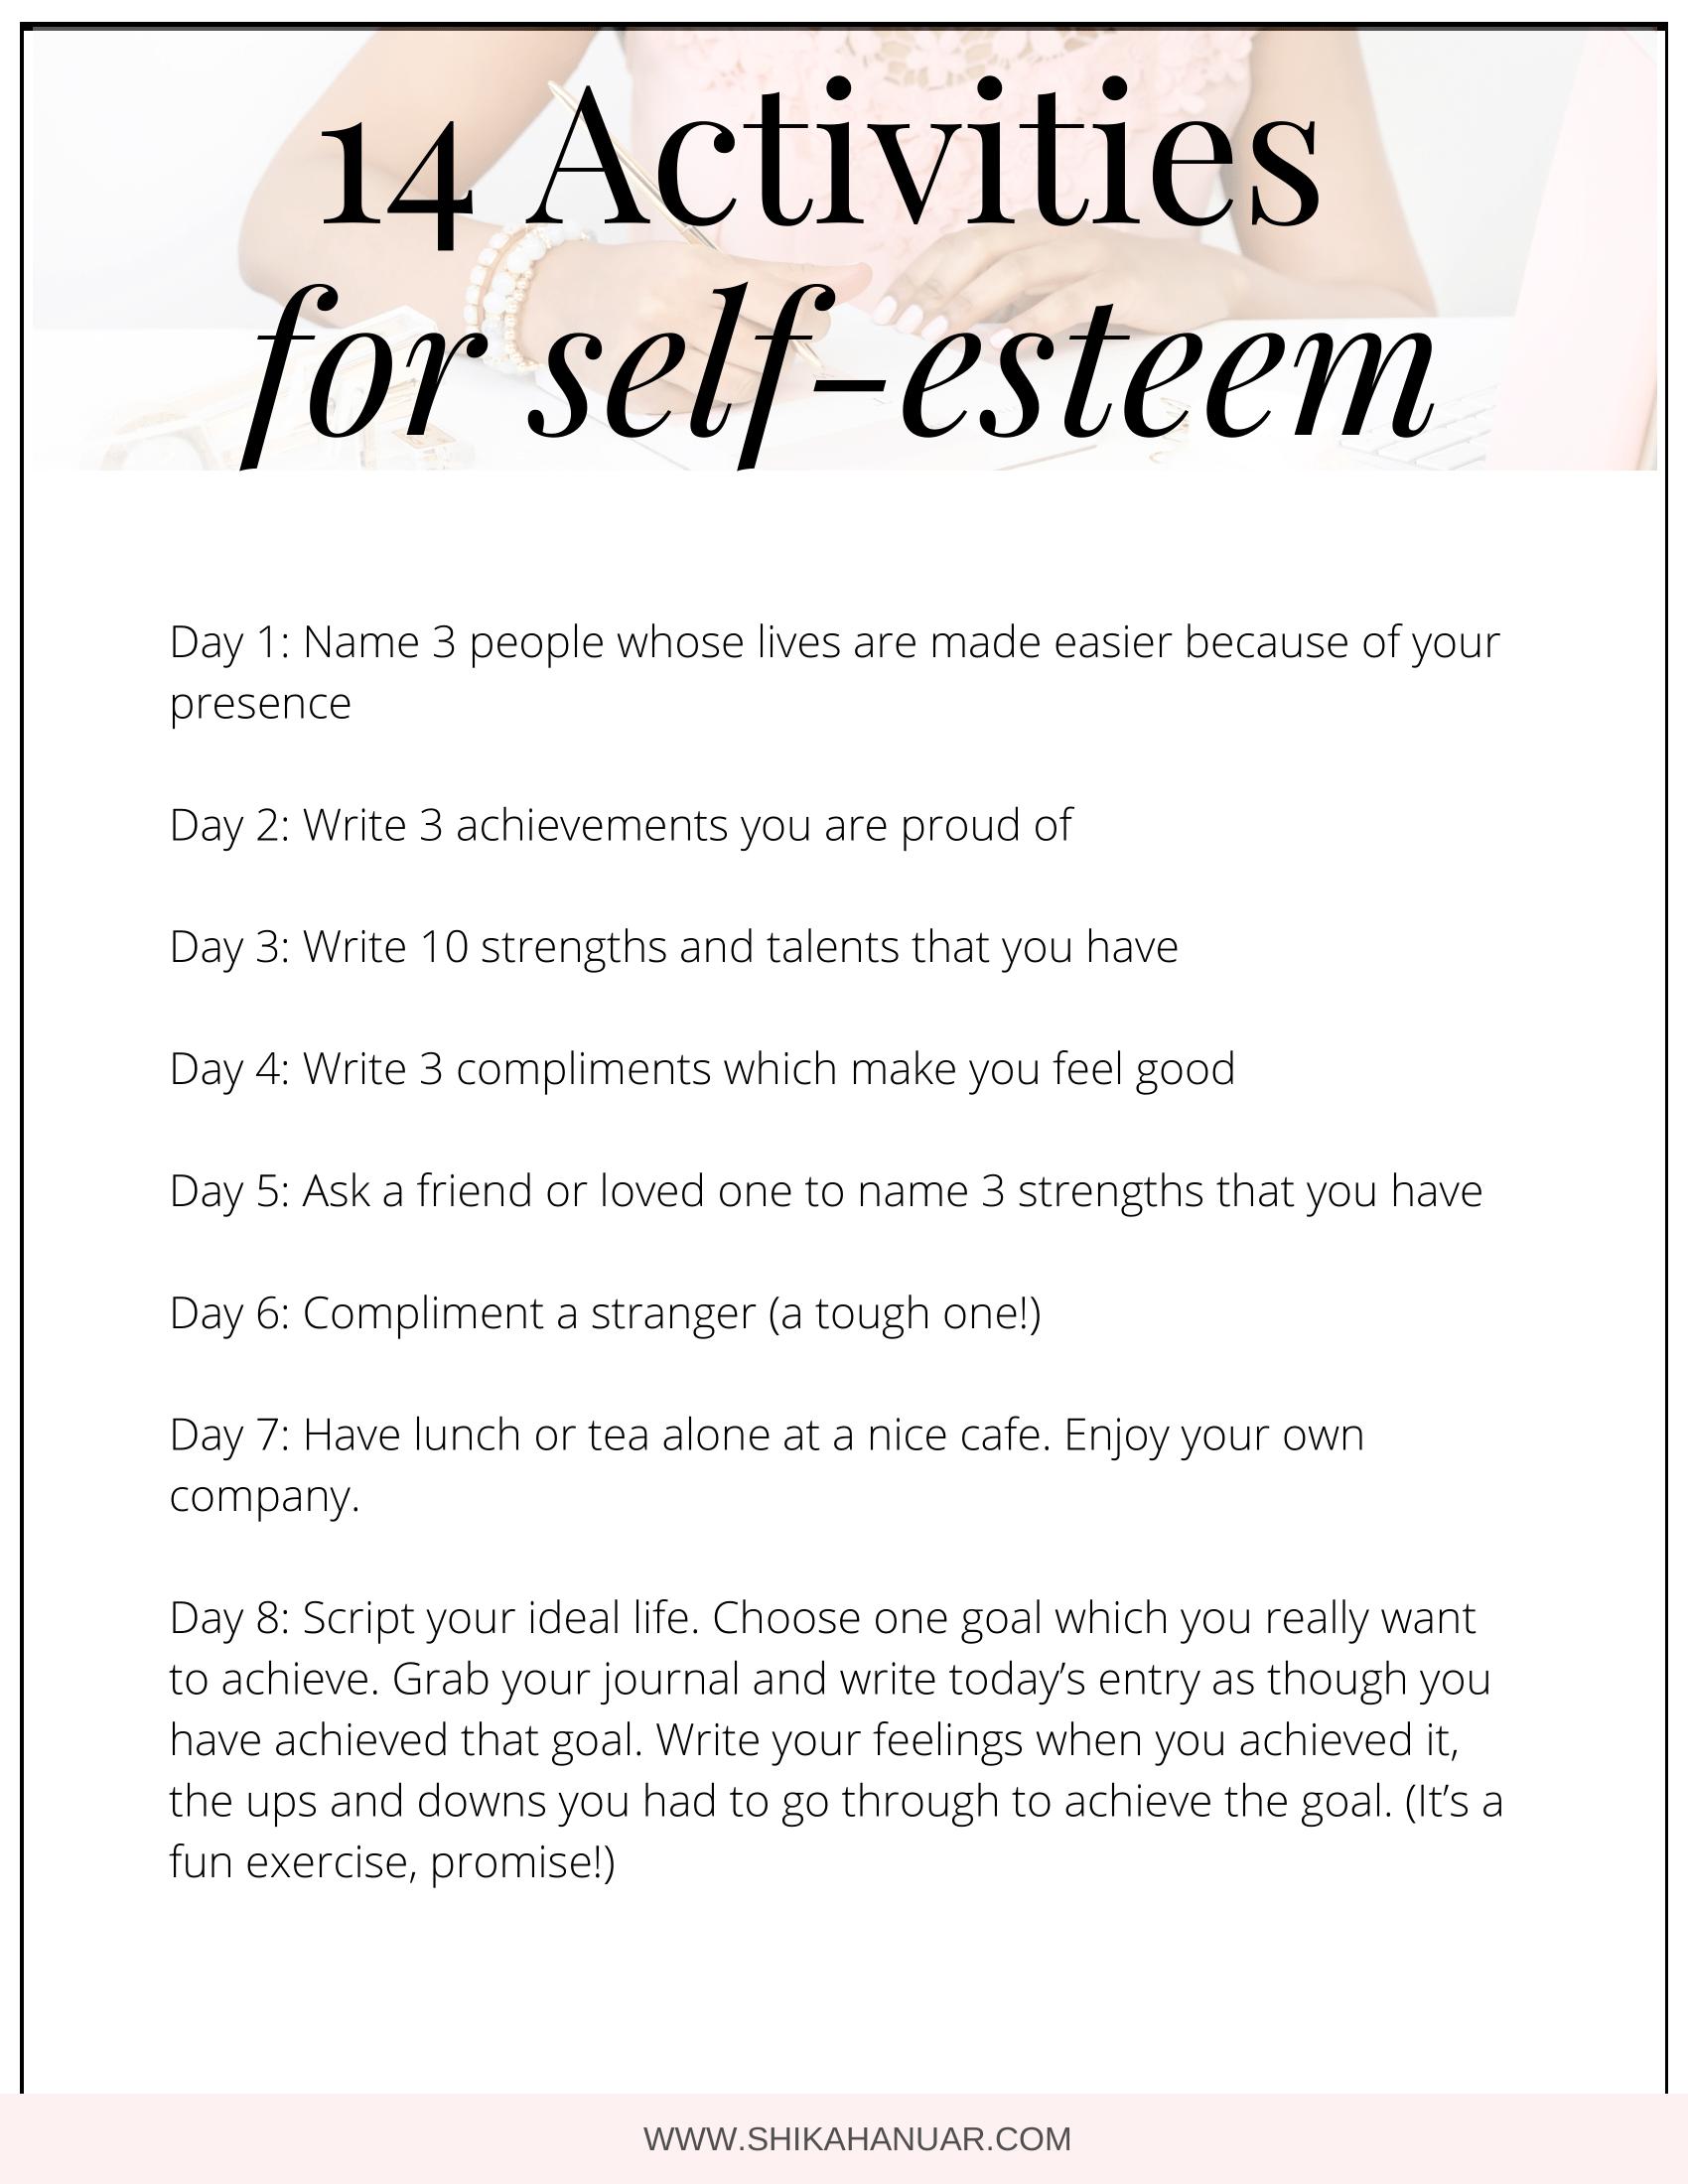 14 Activities To Build Self Esteem And Self Worth In 2020